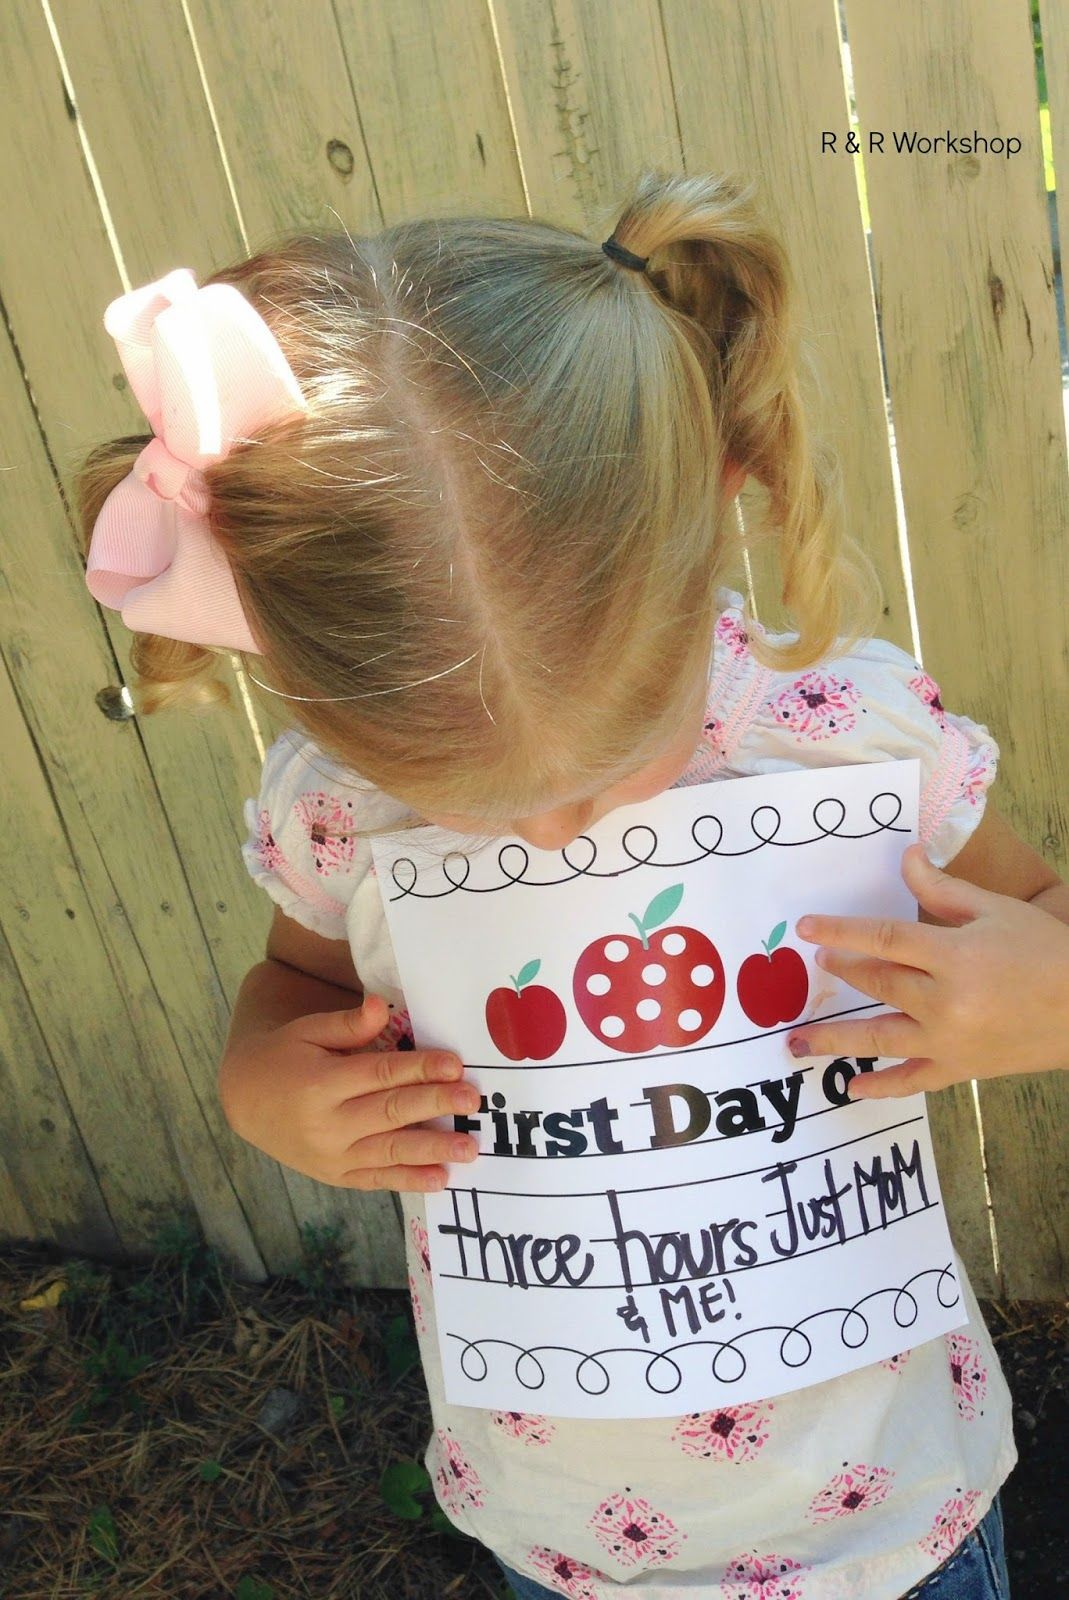 First Day of School (Free Printable) www.randrworkshop.com #freeprintable #backtoschool